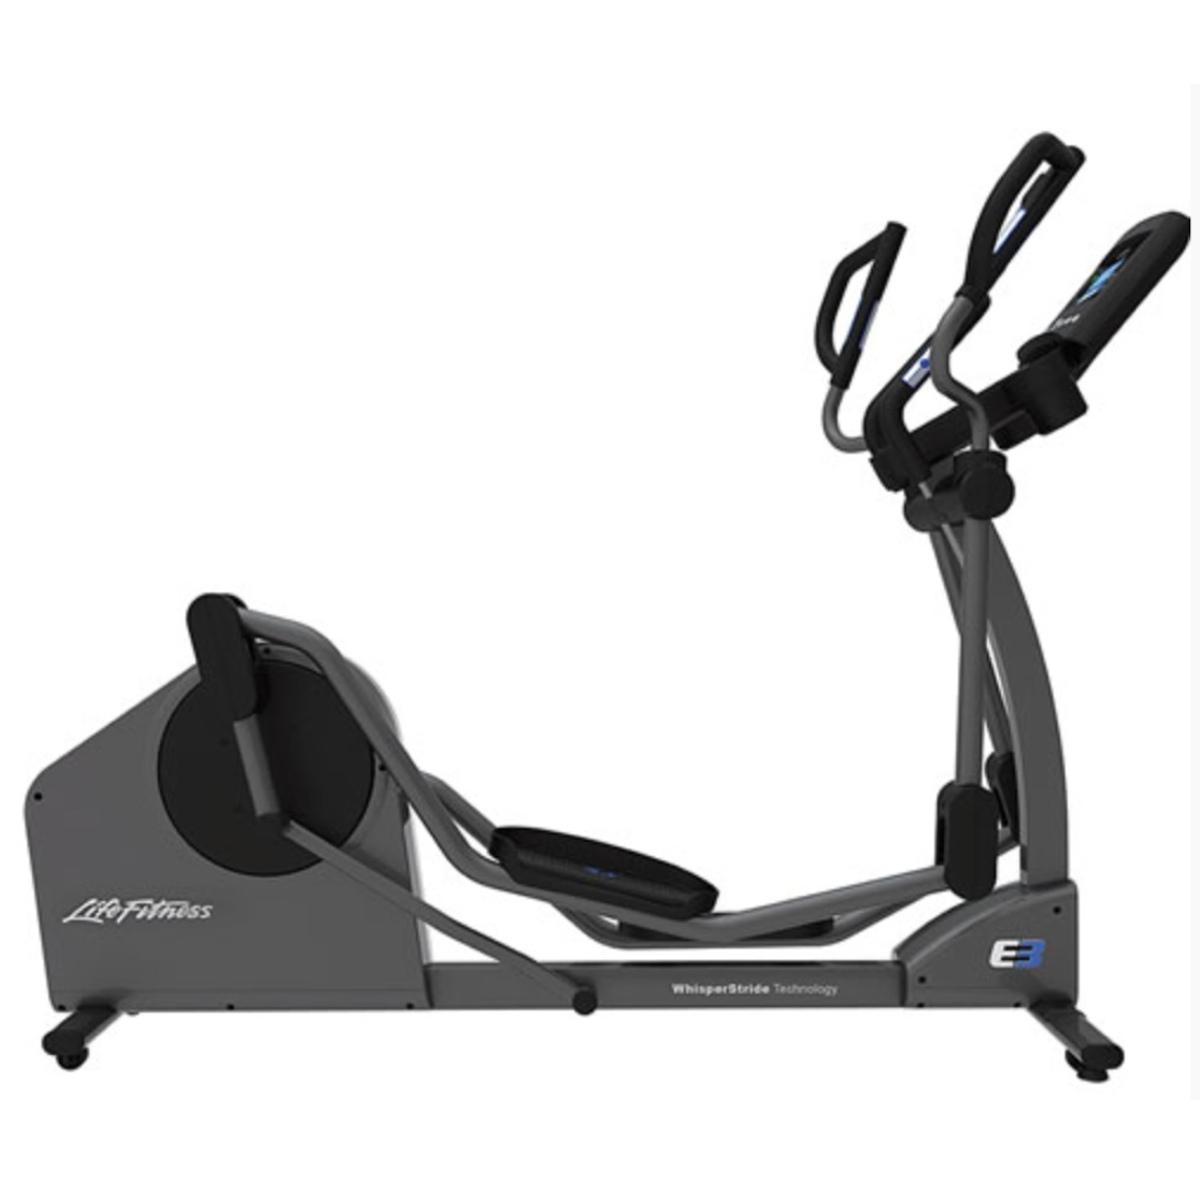 seitlich-Life-Fitness-E3-Track-Crosstrainer-Elliptical